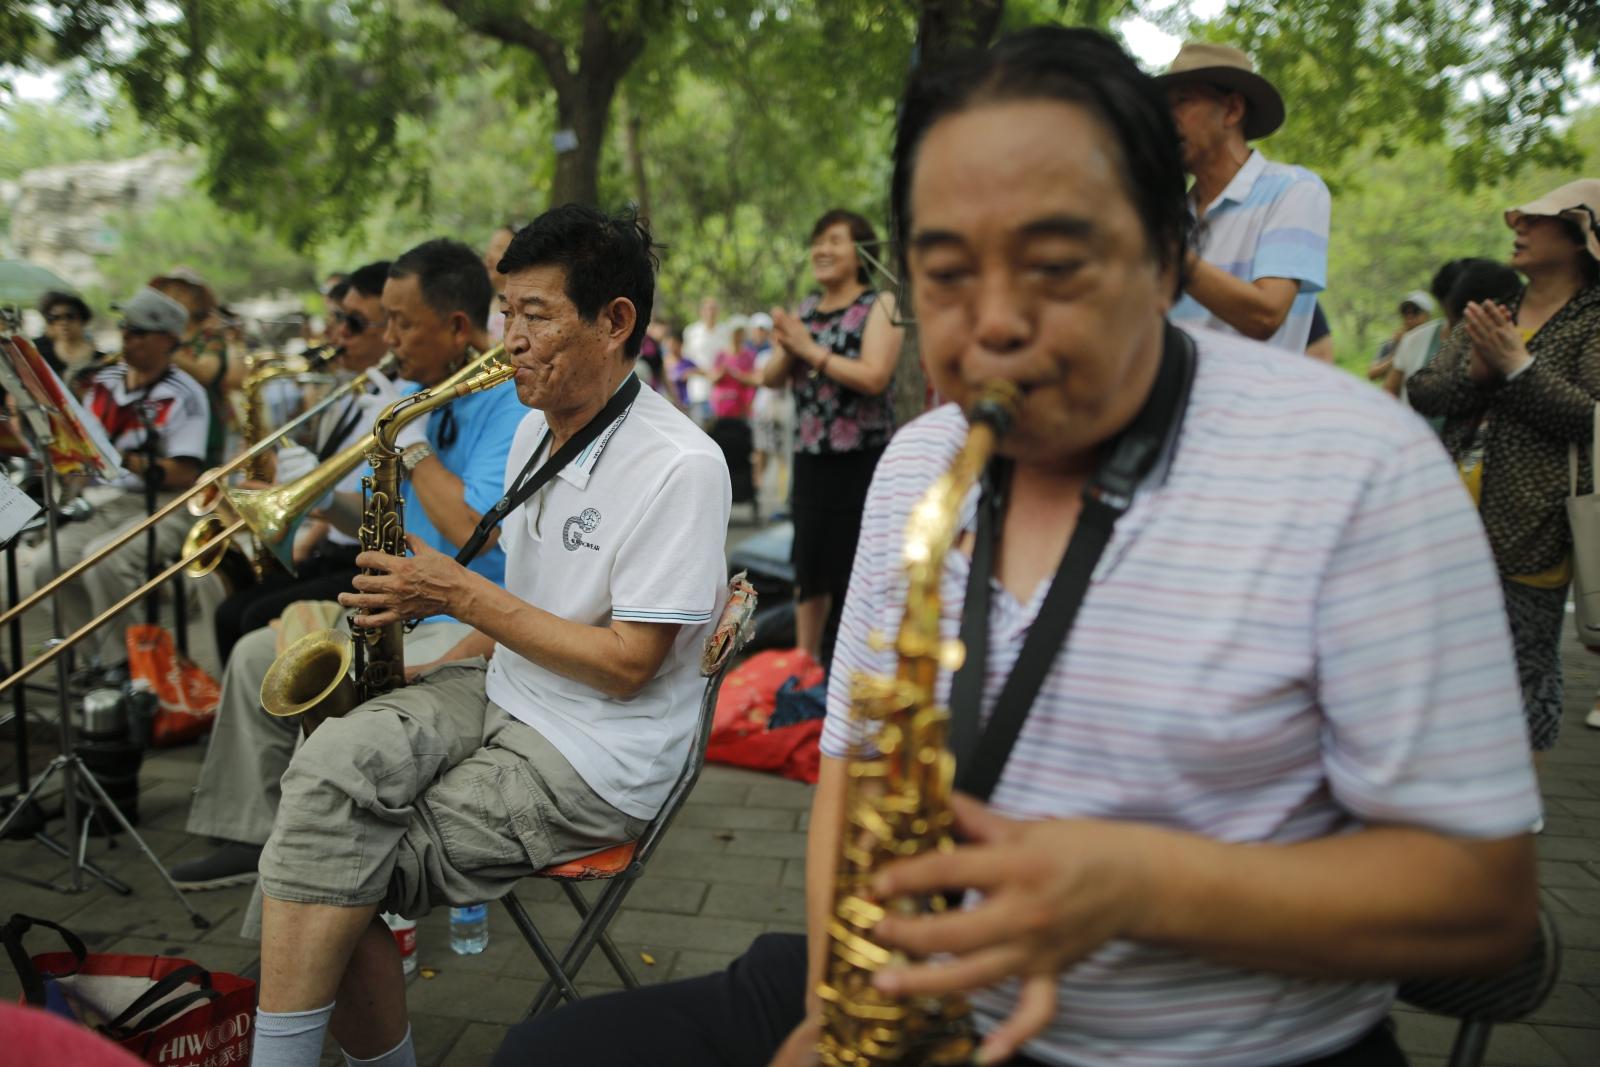 Lokalny festyn w Pekinie. Fot.  EPA/WU HONG Dostawca: PAP/EPA.